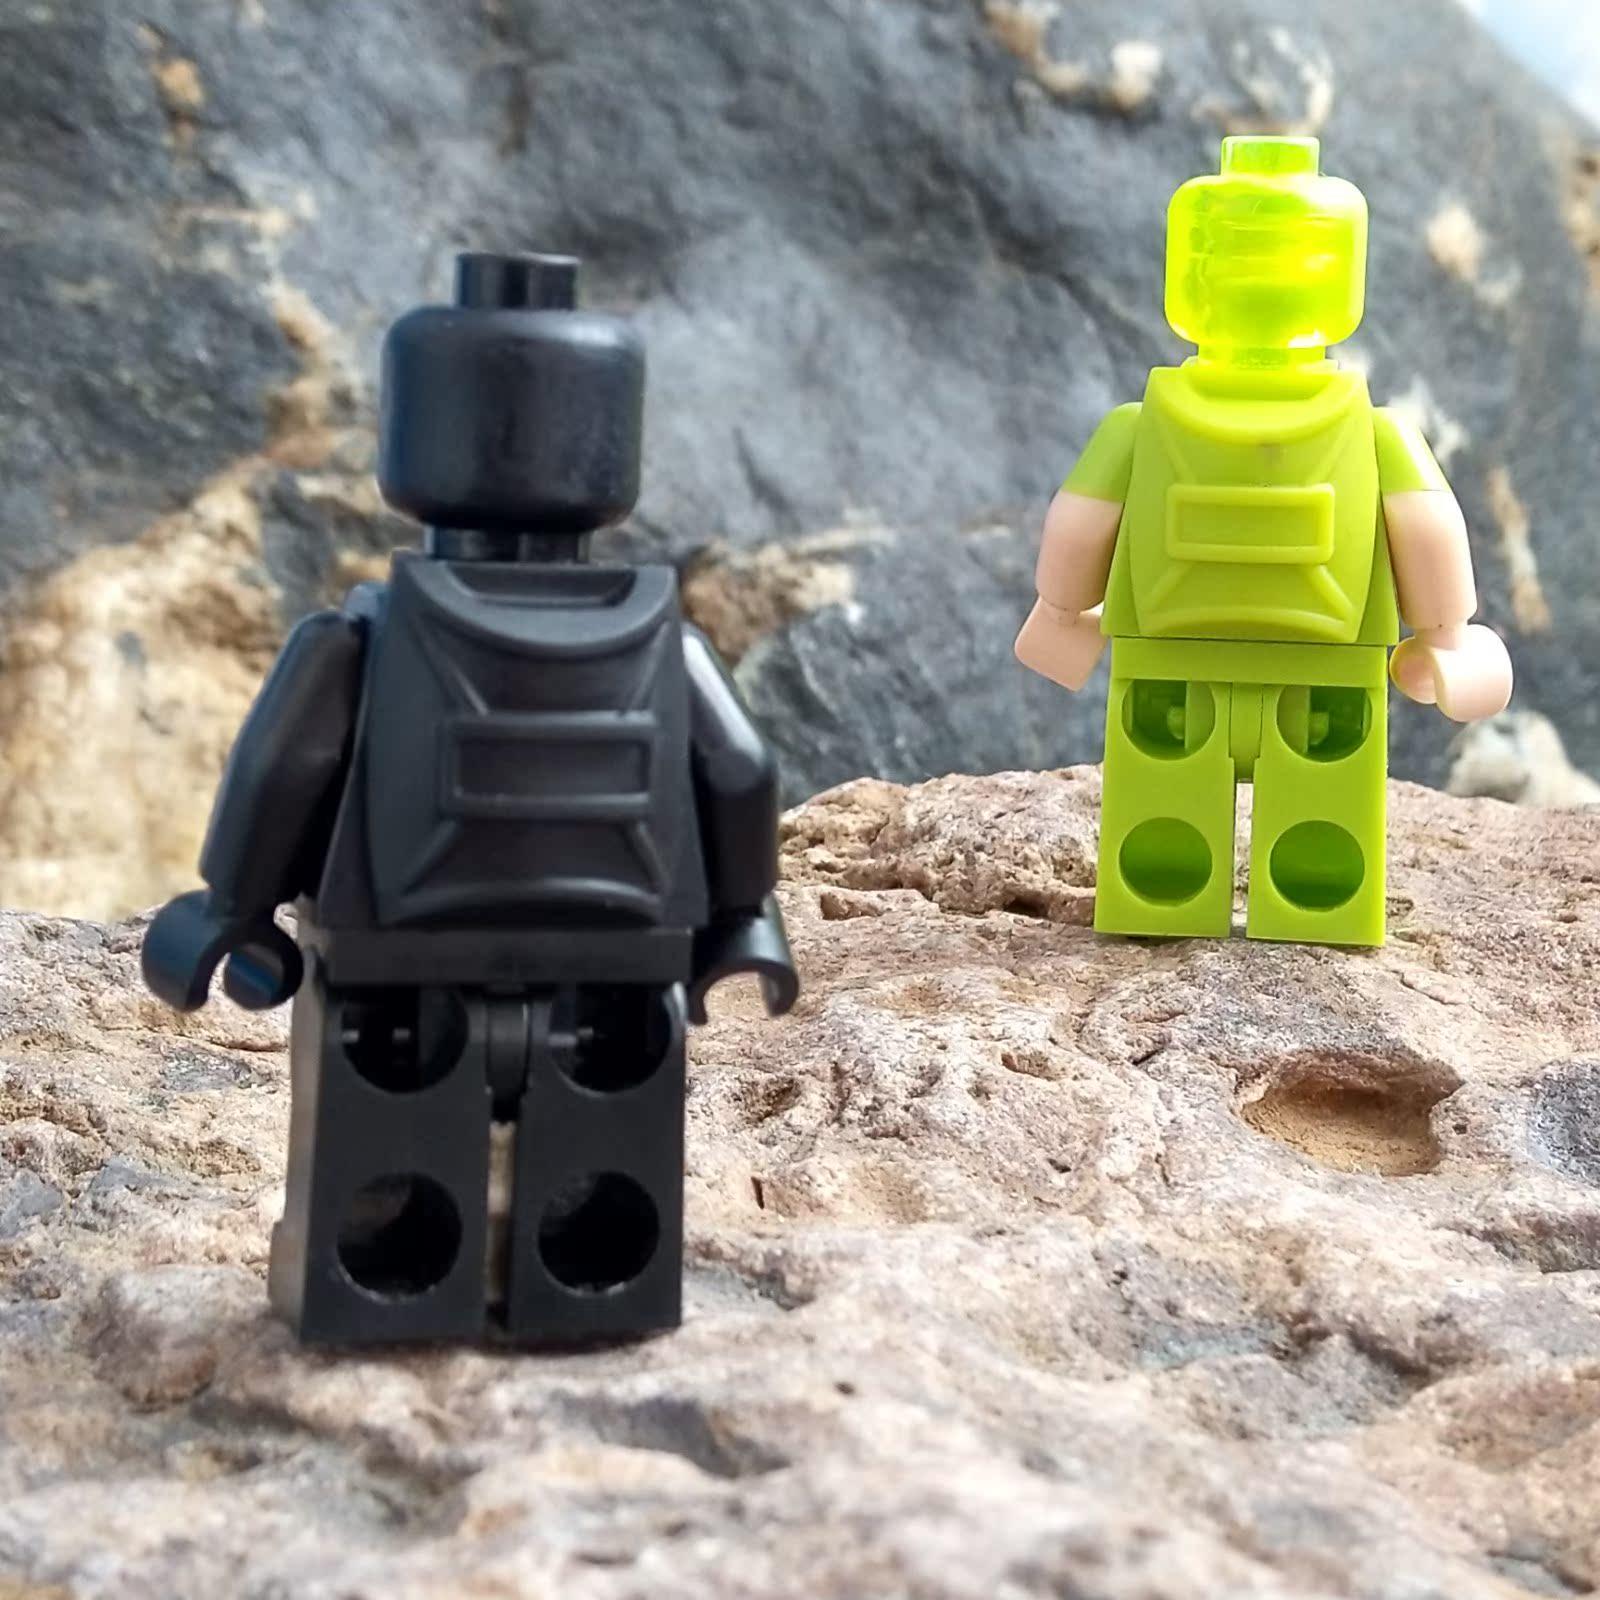 LEGO乐高人仔零配件12897(6159567)黑色书包背包人仔穿戴设备